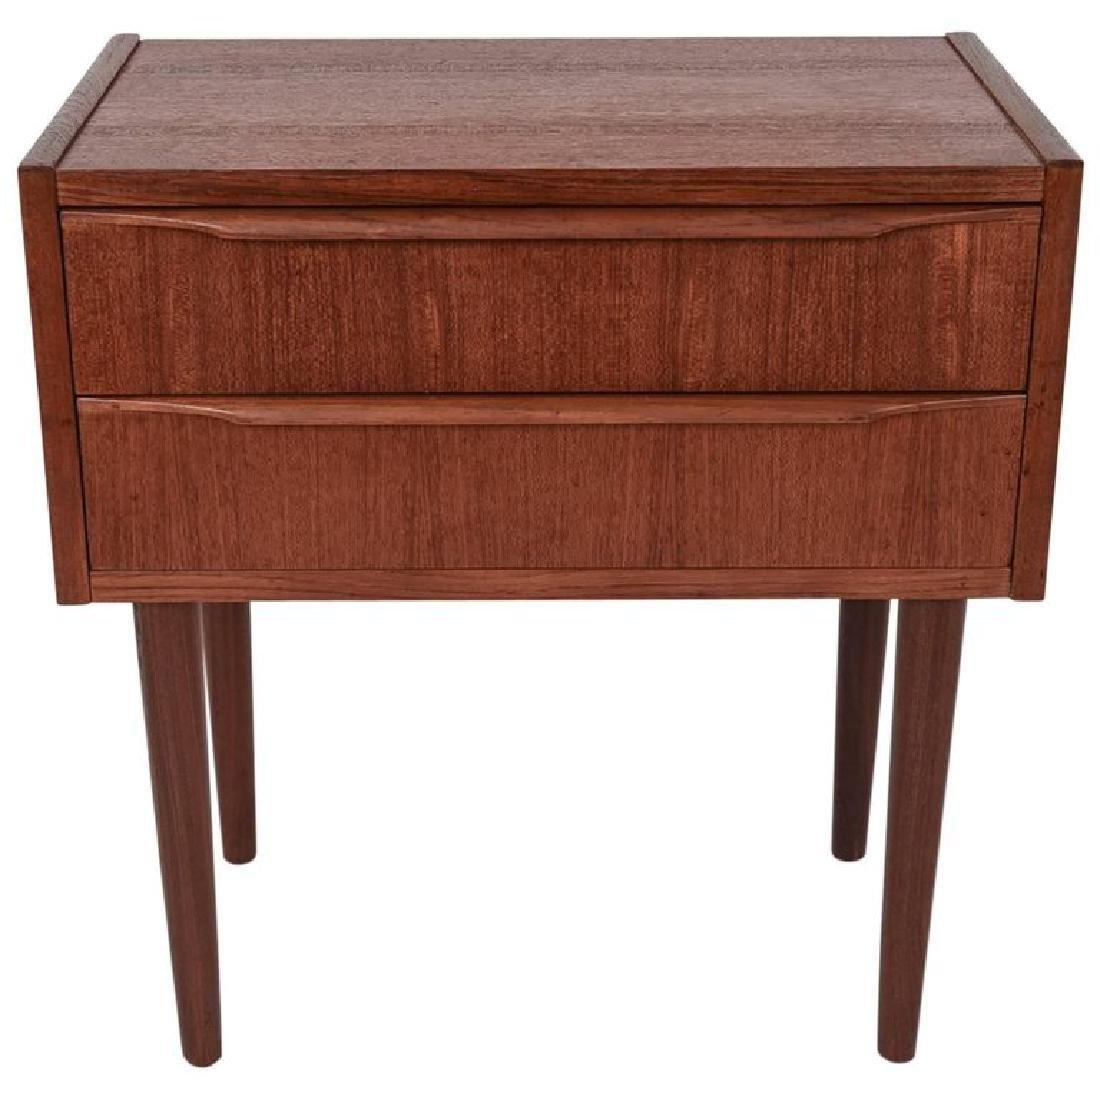 DANISH MID-CENTURY TWO-DRAWER TEAK SIDE TABLE